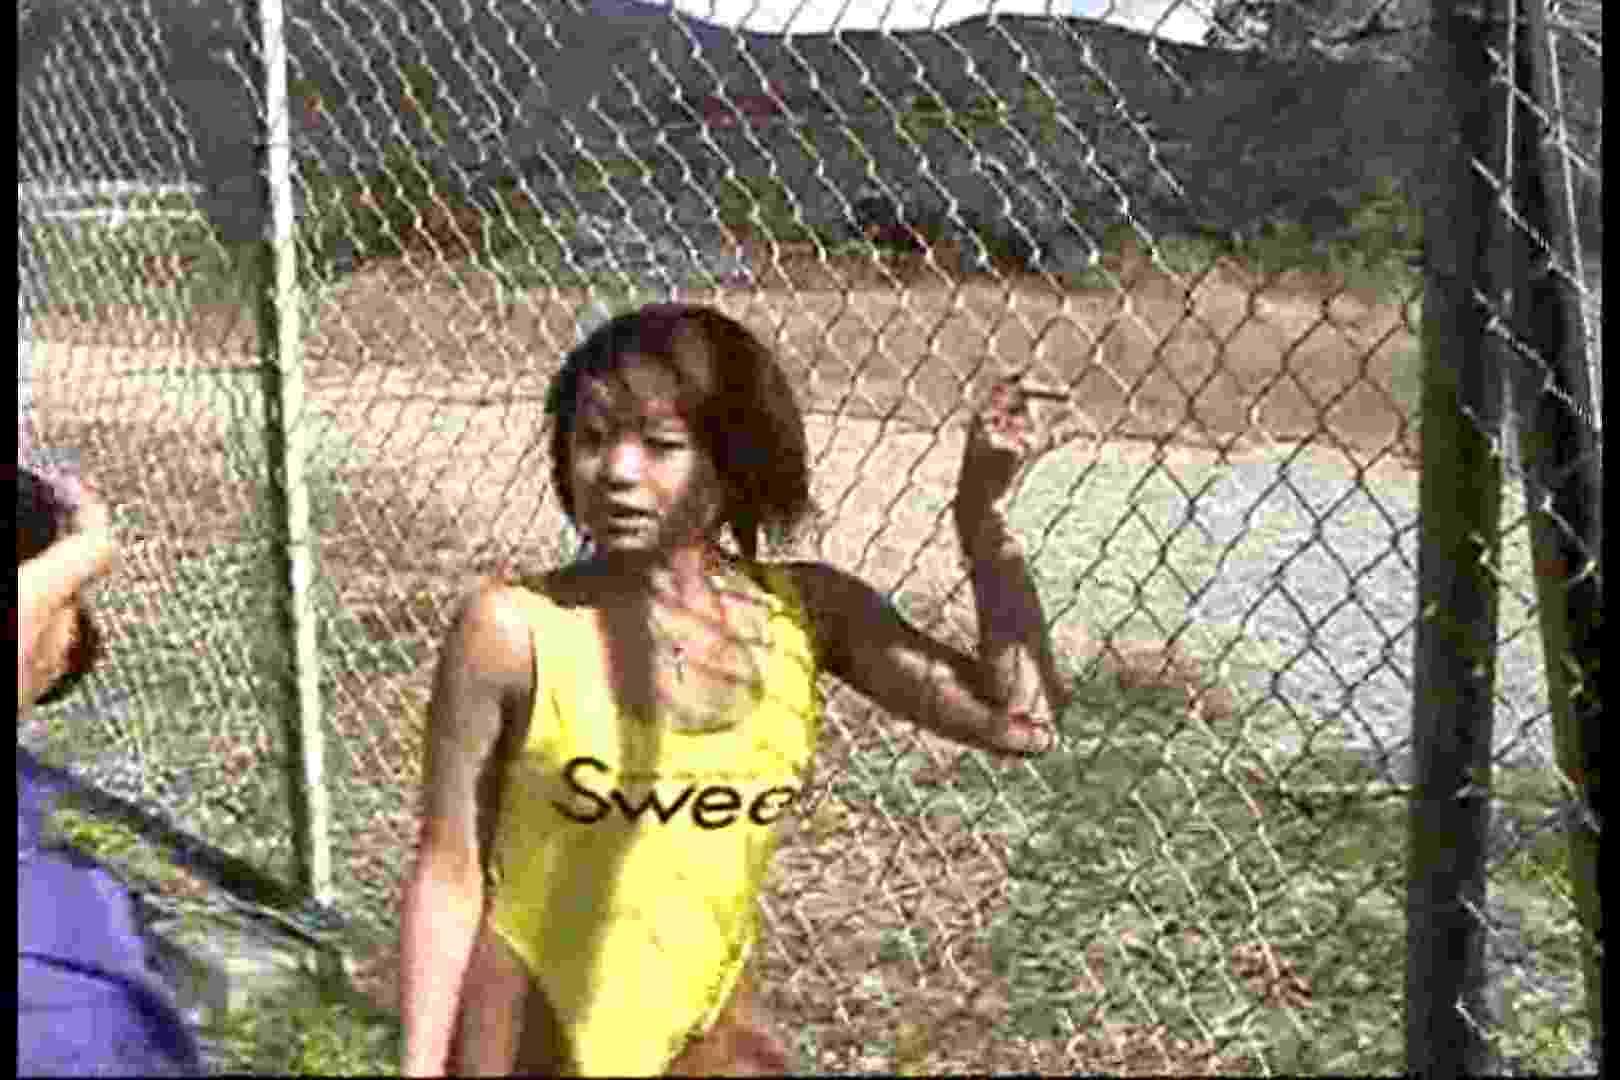 RQカメラ地獄Vol.8 美女OL   レースクイーン  84連発 69